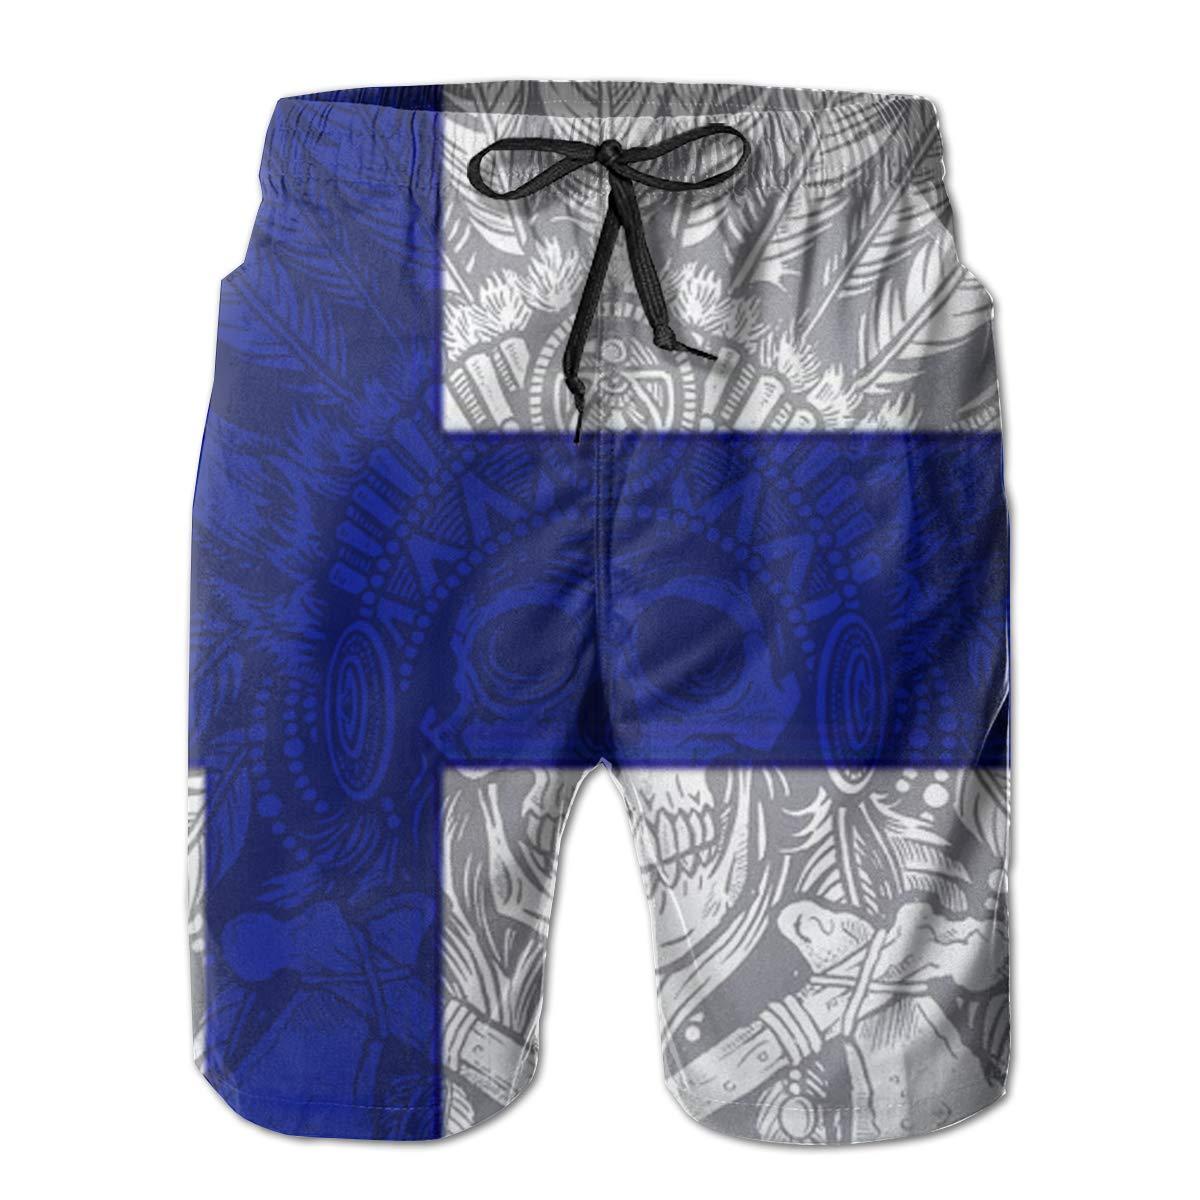 ONE-HEART-HR Men Tribal Skull Finland Flag Summer Swim Trunk Board Short Beach Shorts